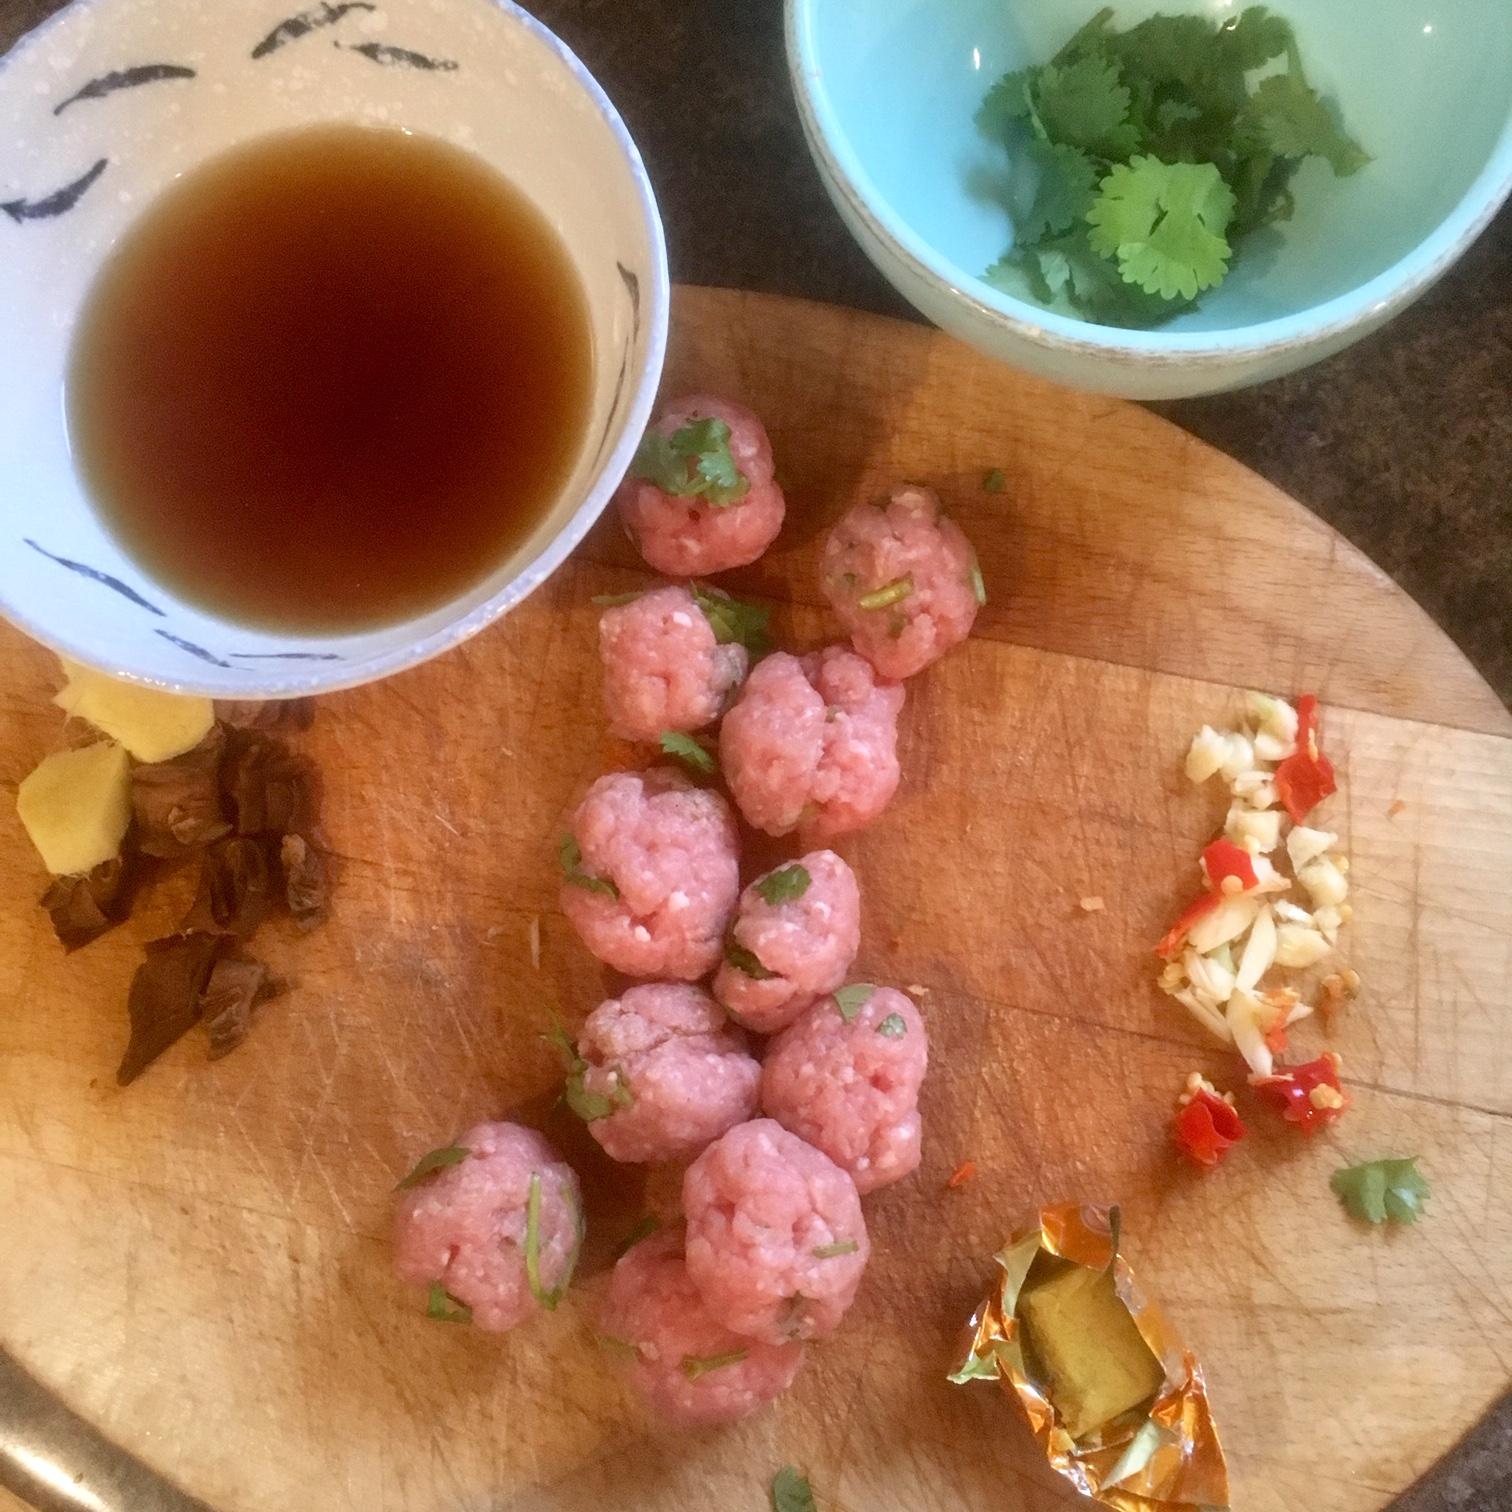 Rachel Redlaw: Vermicelli noodle soup with minced pork